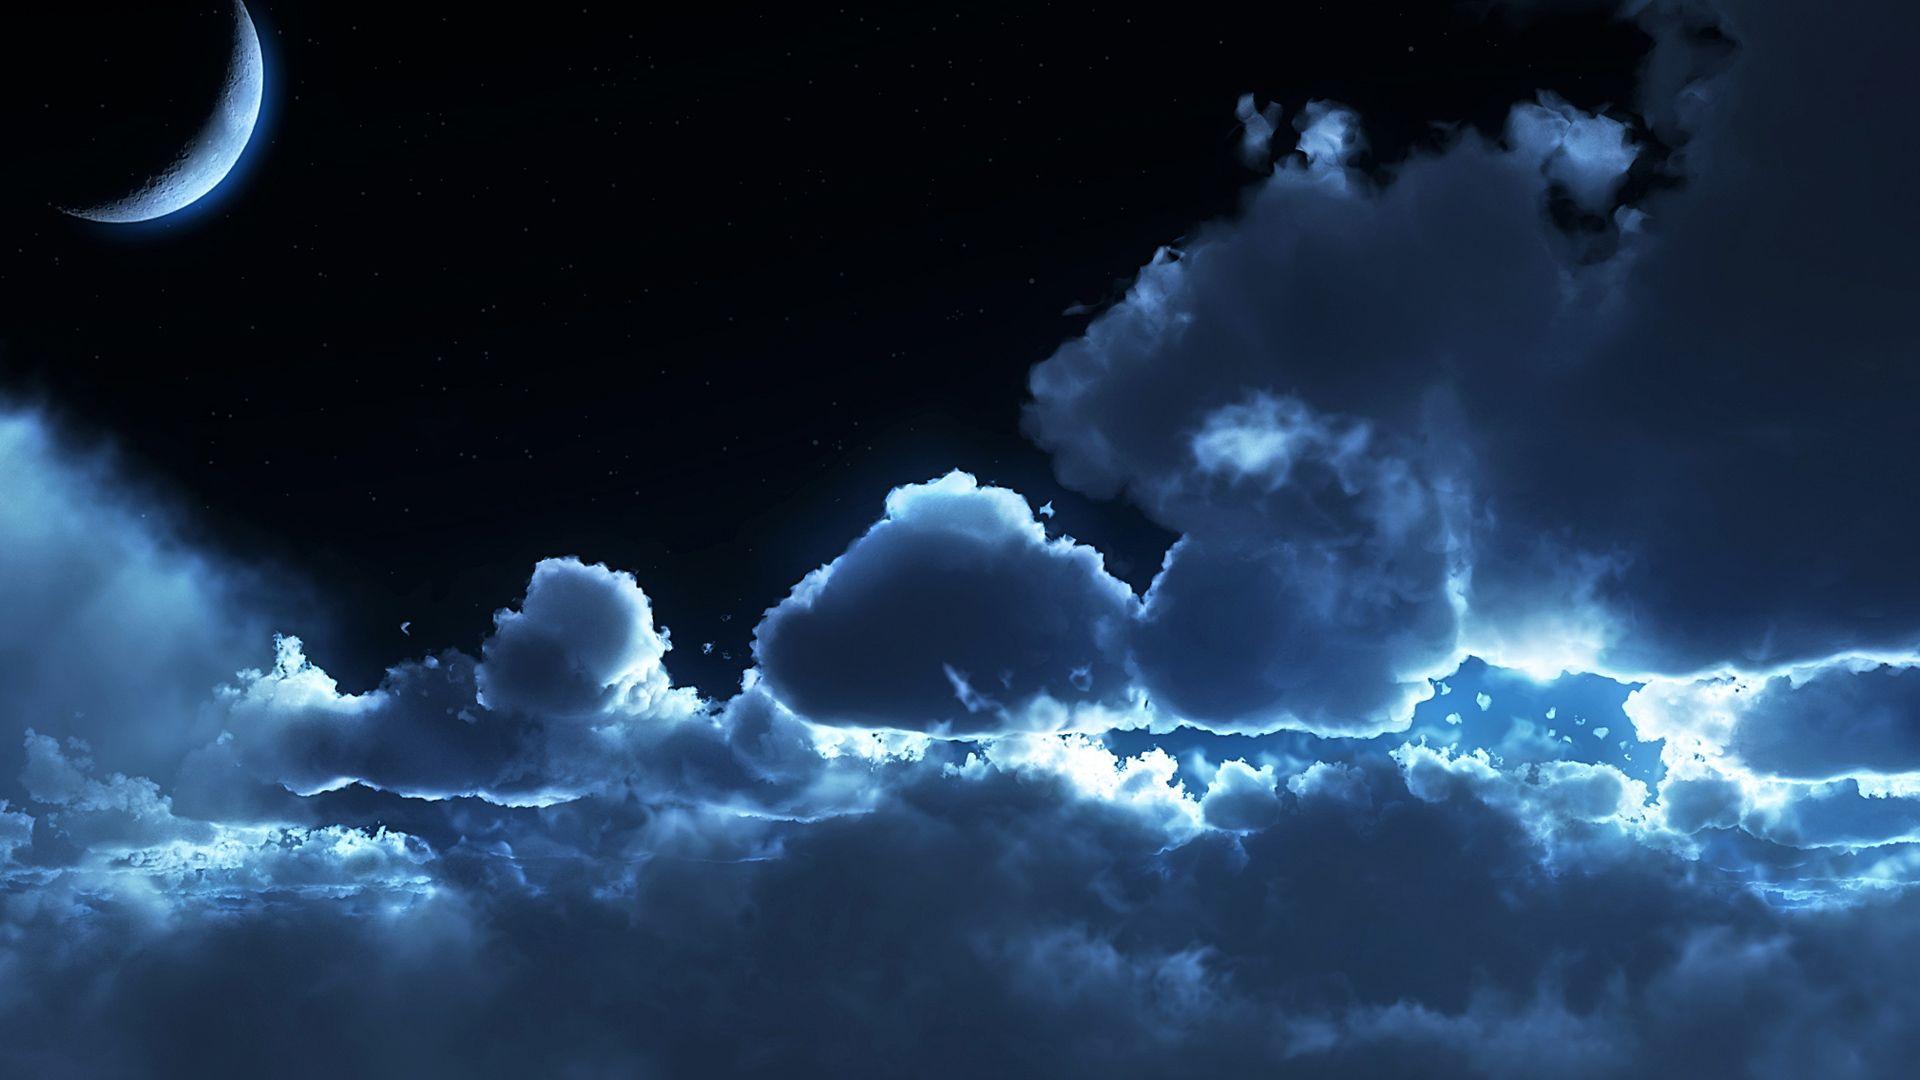 Dark Clouds wallpaper free